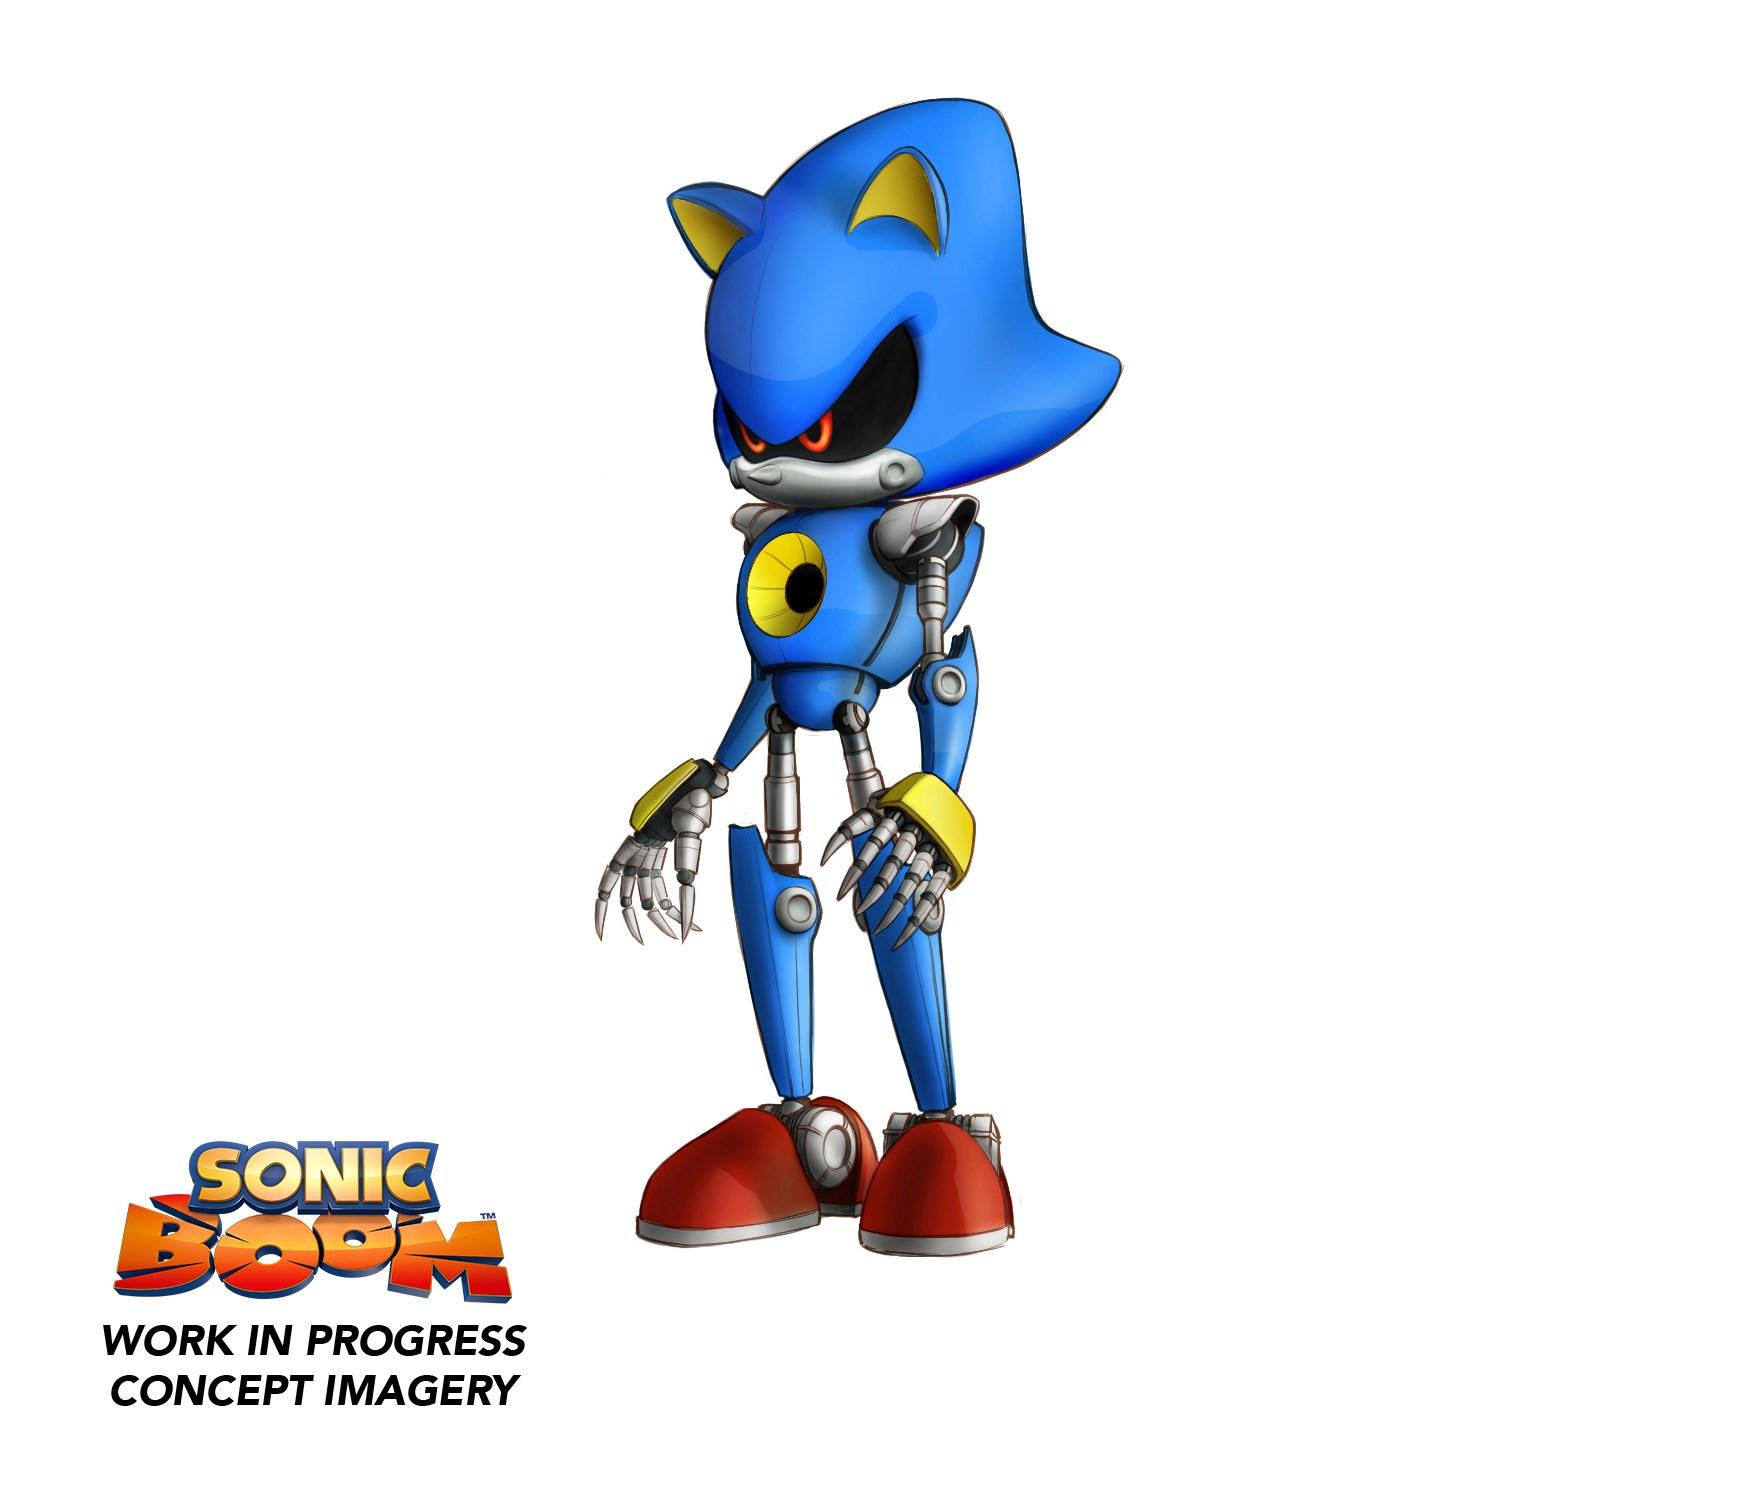 Sonic Boom 14-08-14 Artwork 005